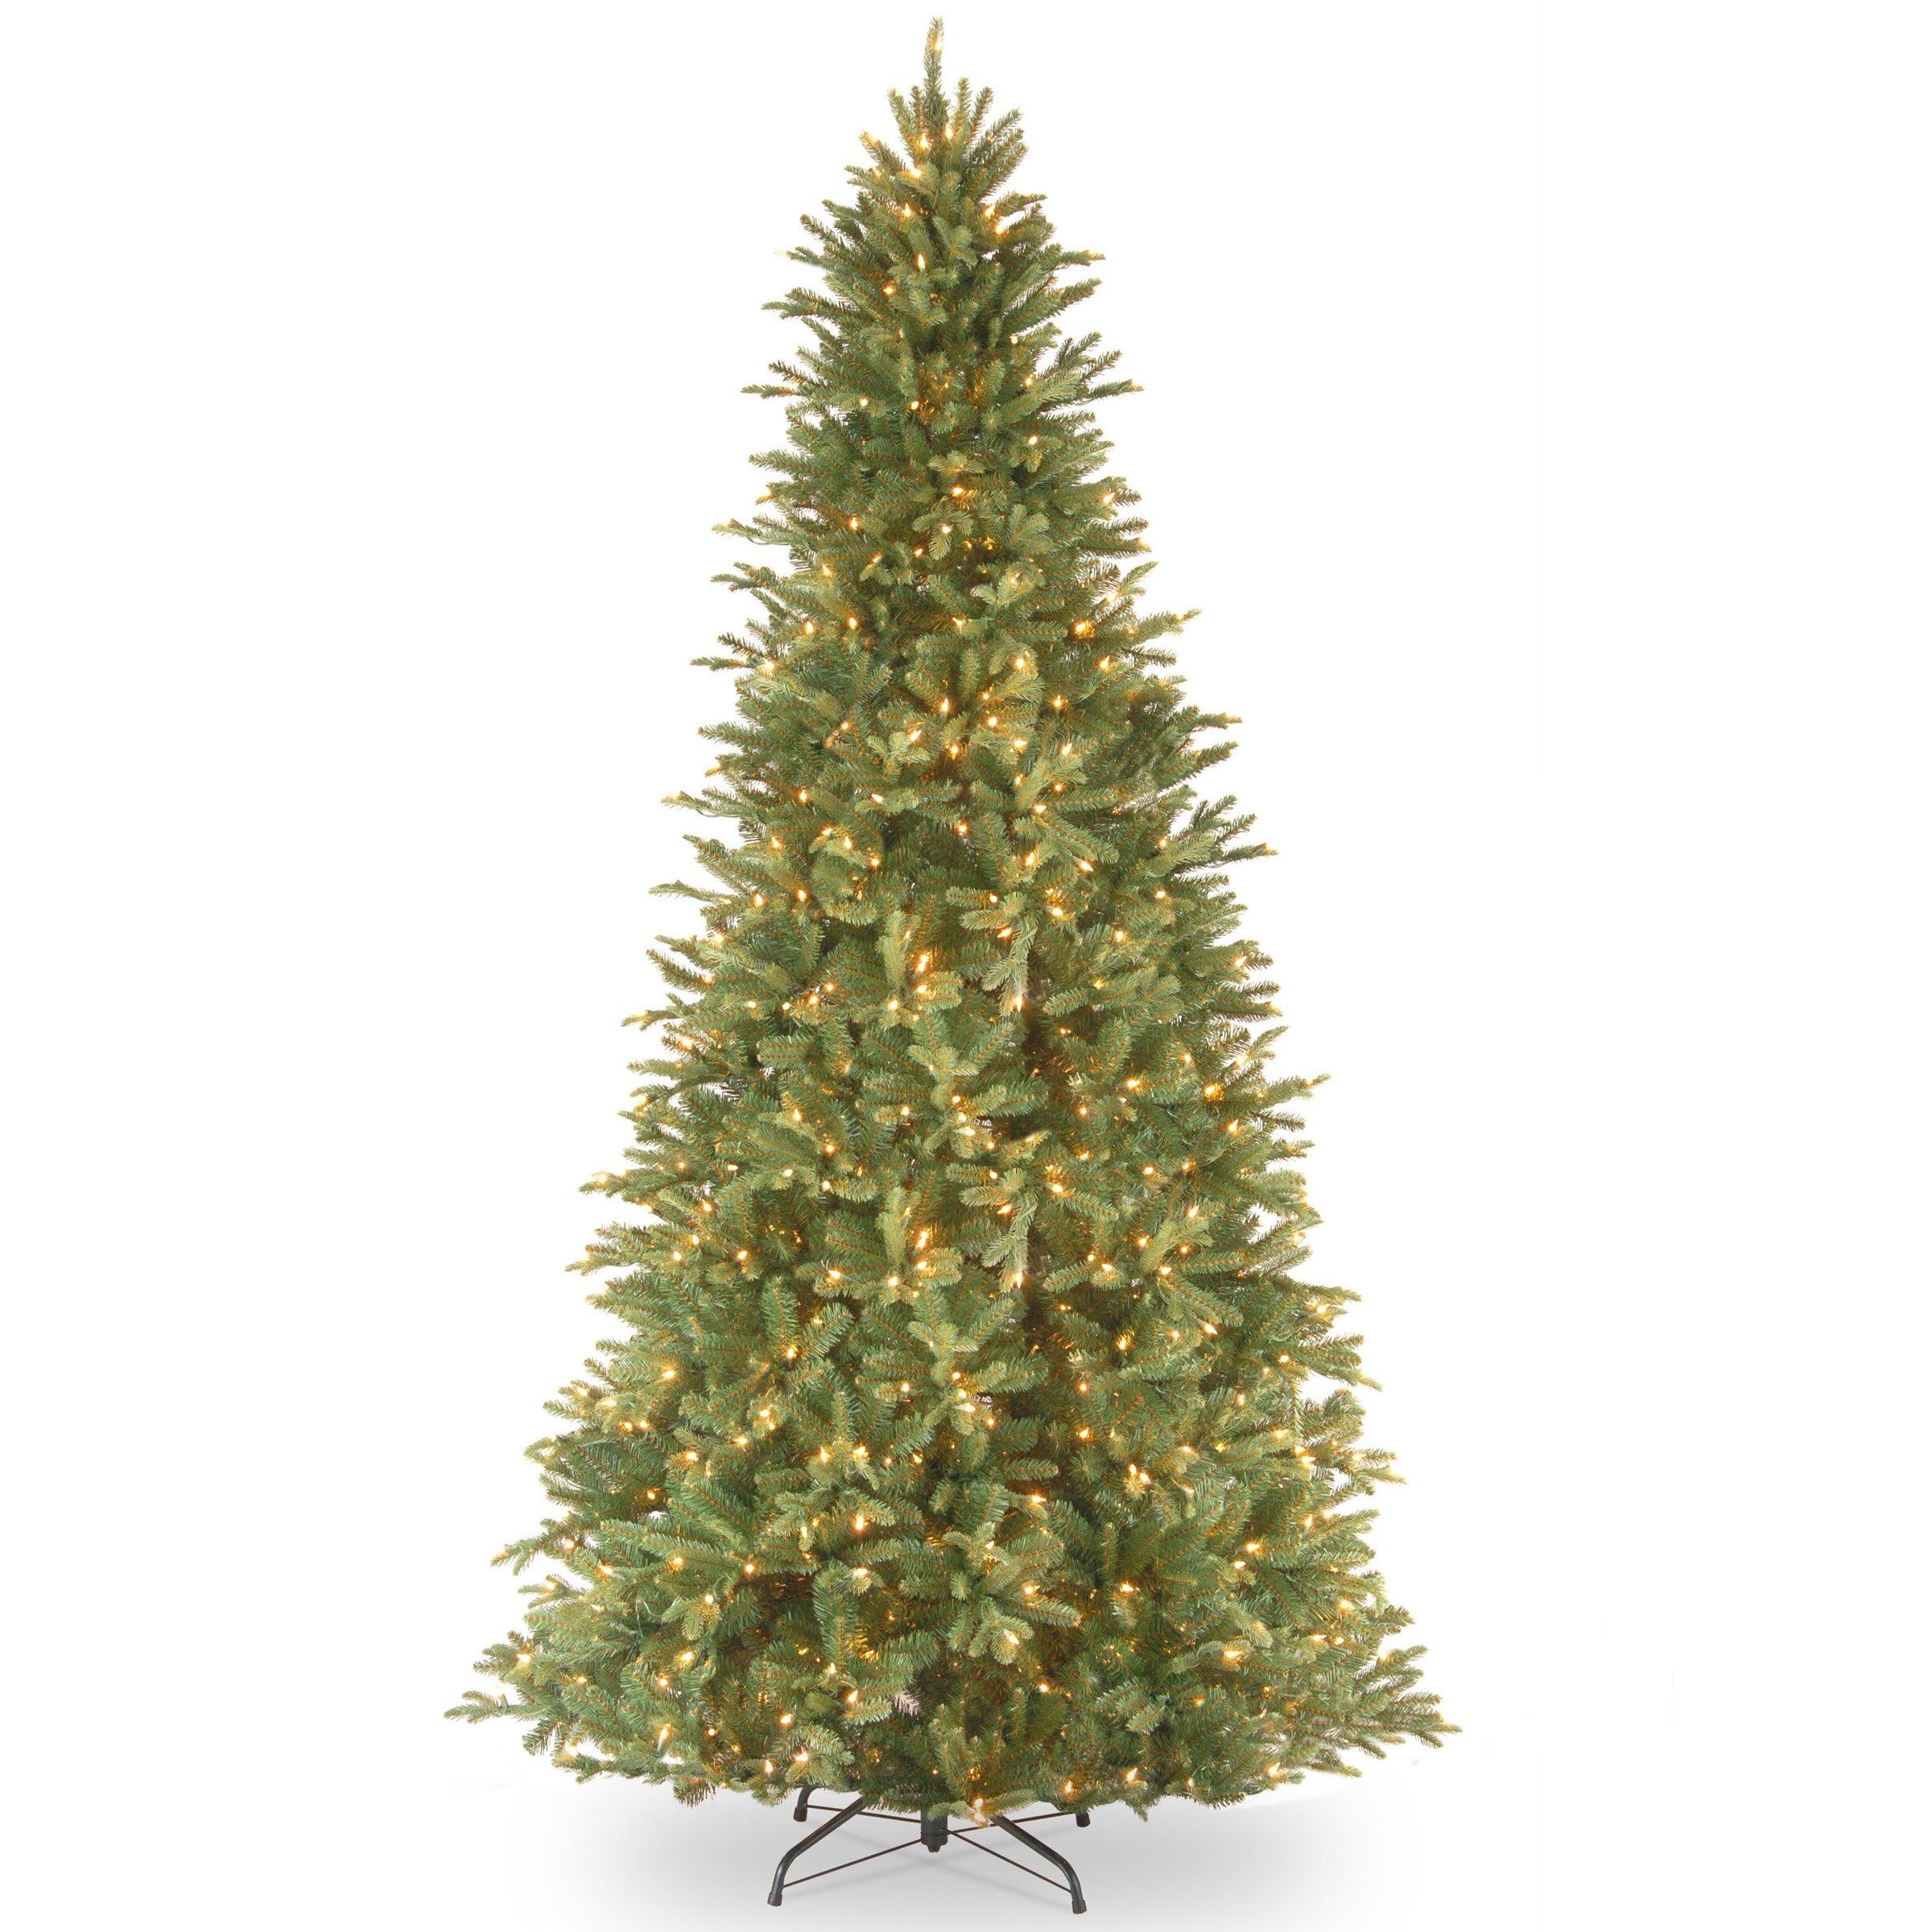 7ft Black Pre Lit Christmas Tree: Tiffany Fir 9' Green Slim Artificial Christmas Tree With